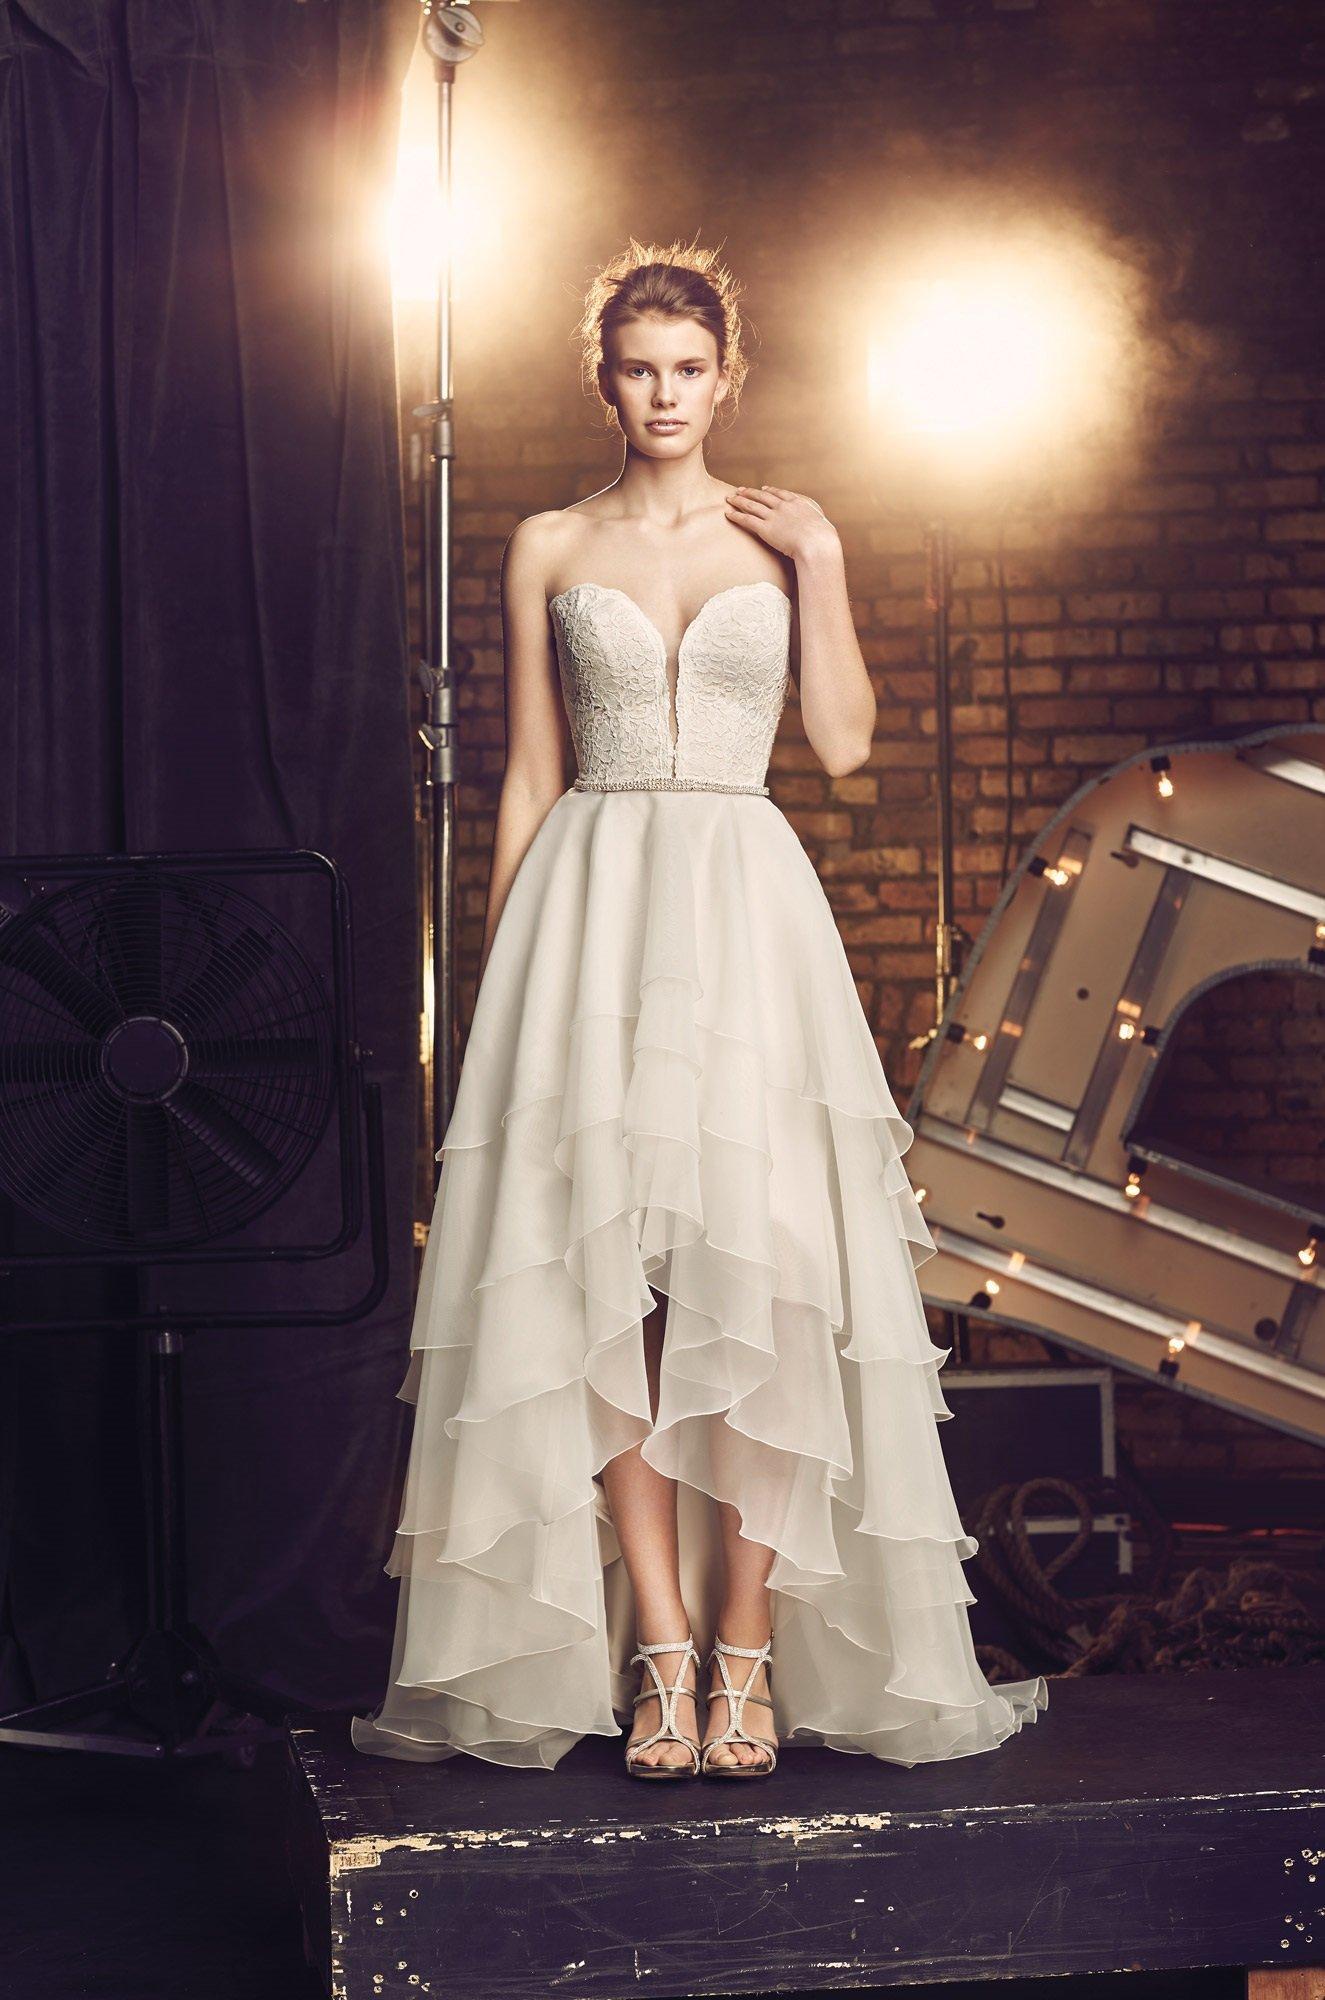 High Low Wedding Dress - Style #2084 | Mikaella Bridal